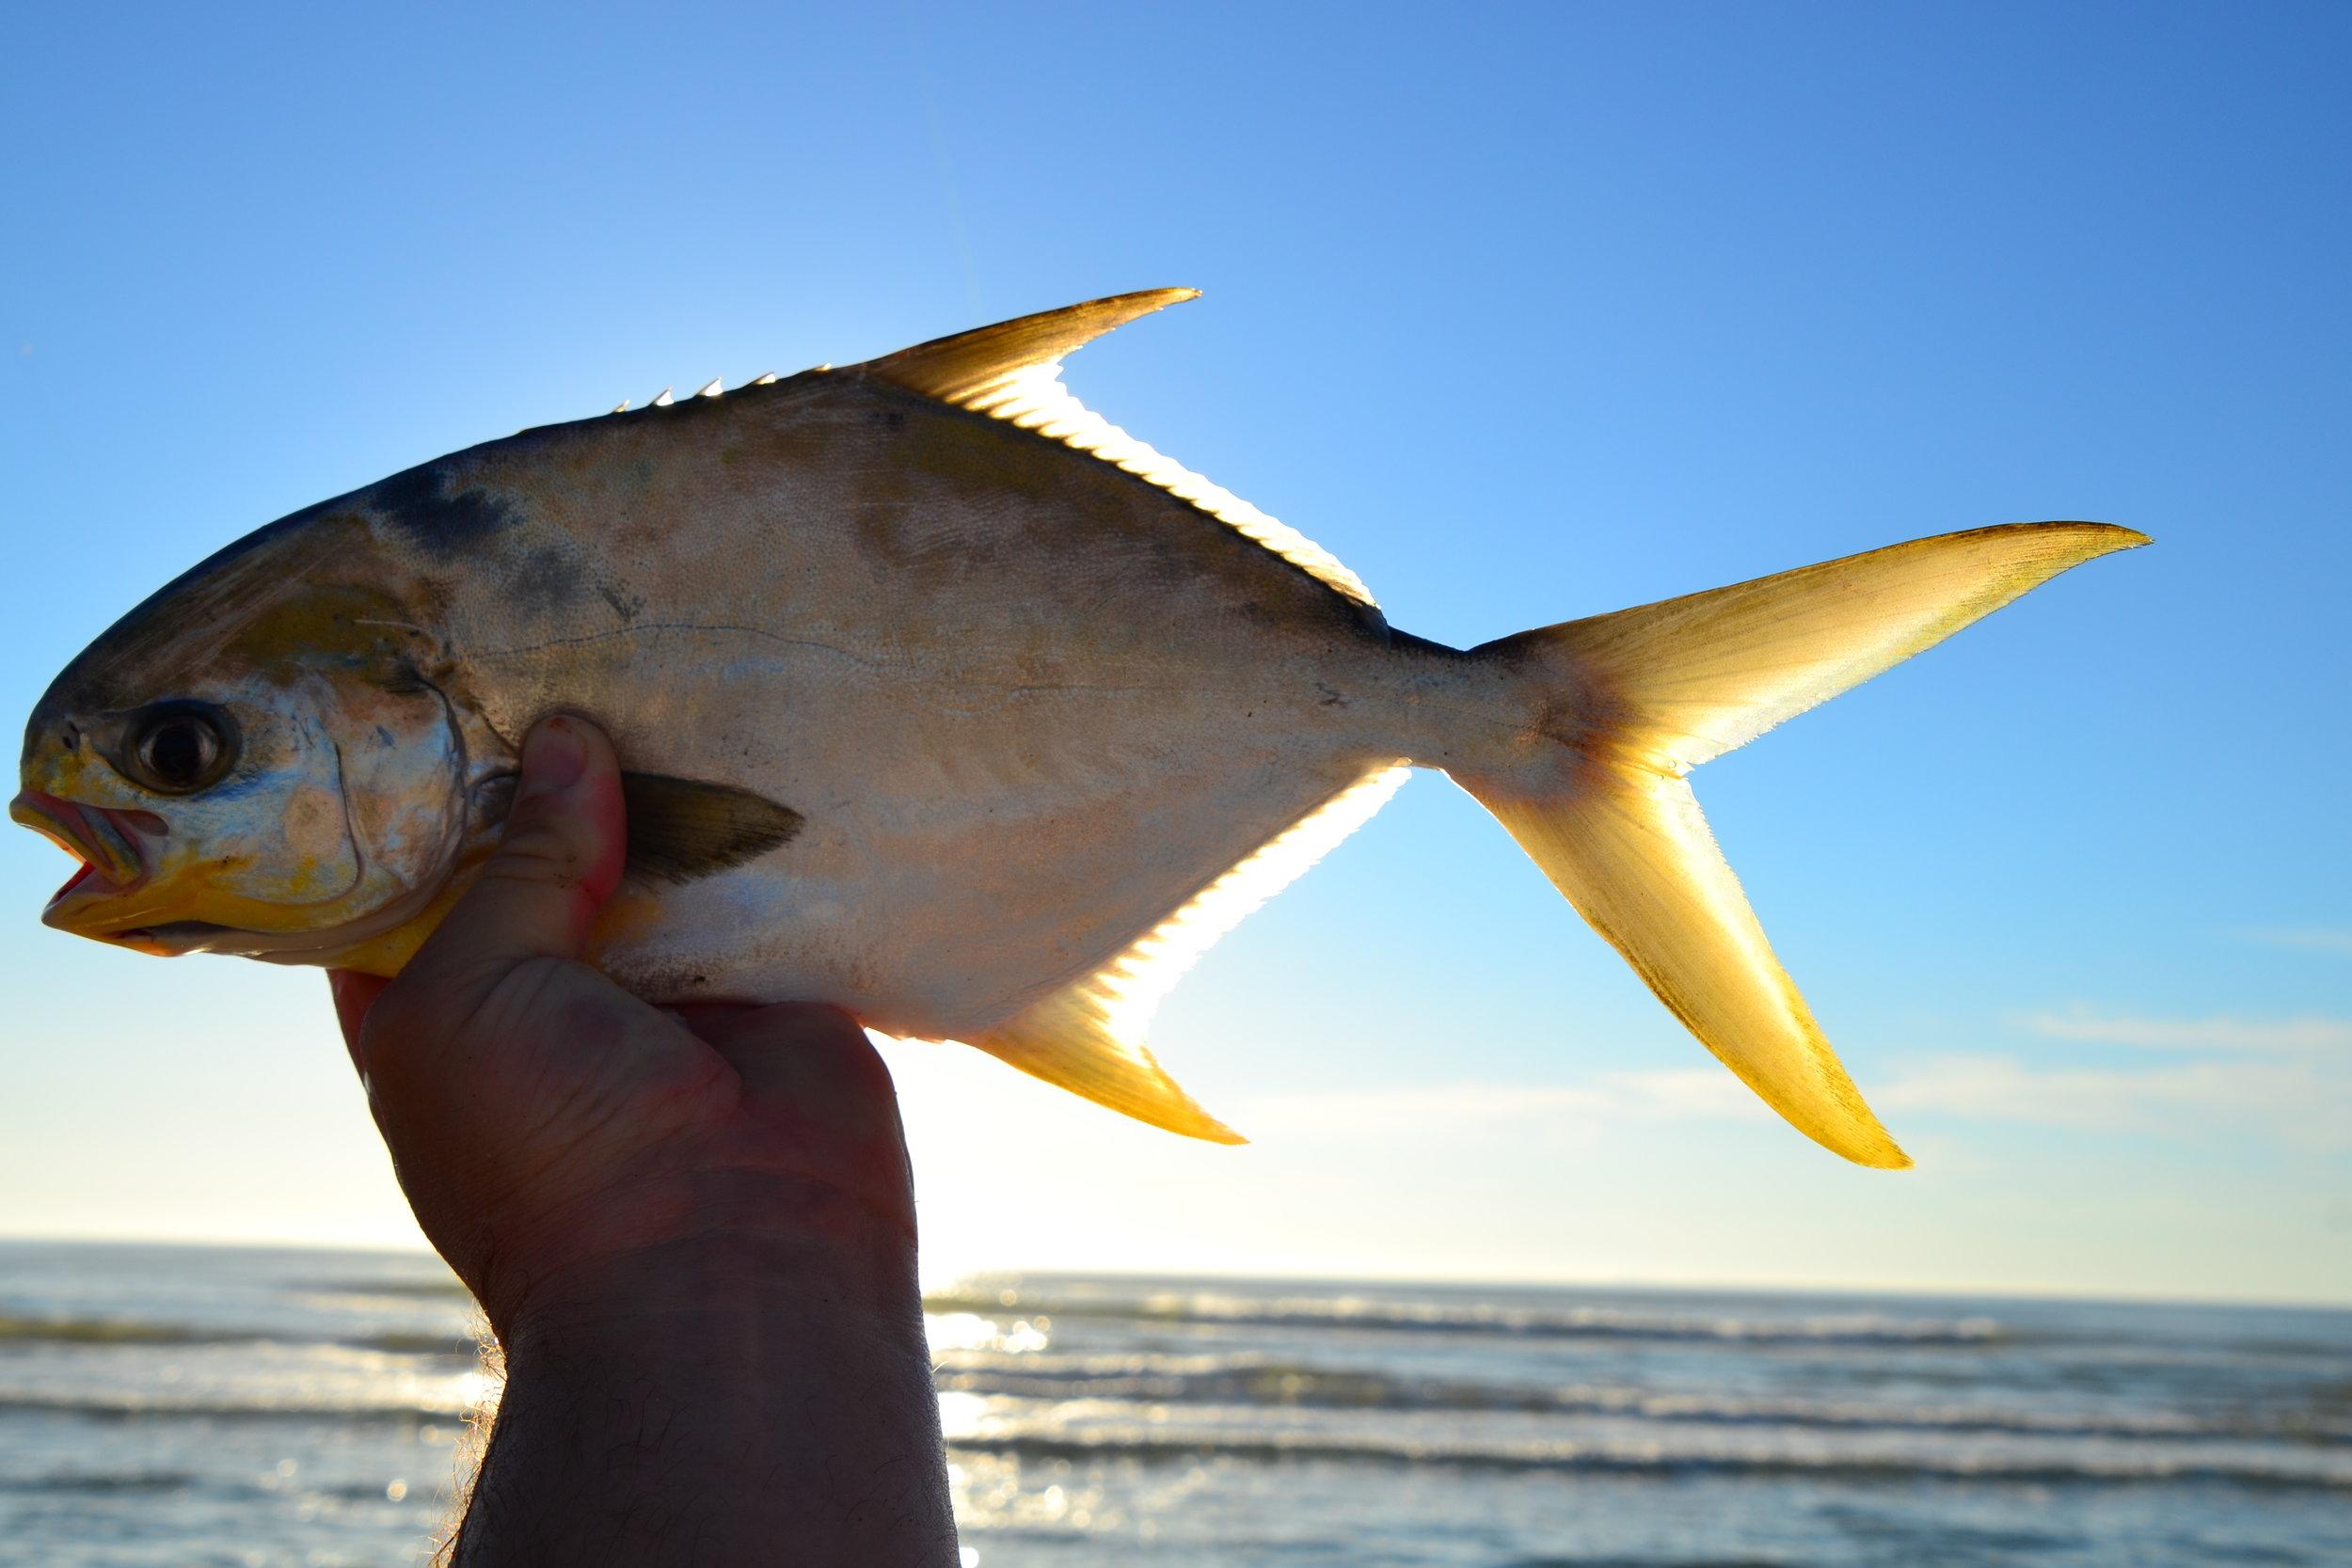 Light SE winds, trout green water, Pompano. - Padre Island National Seashore